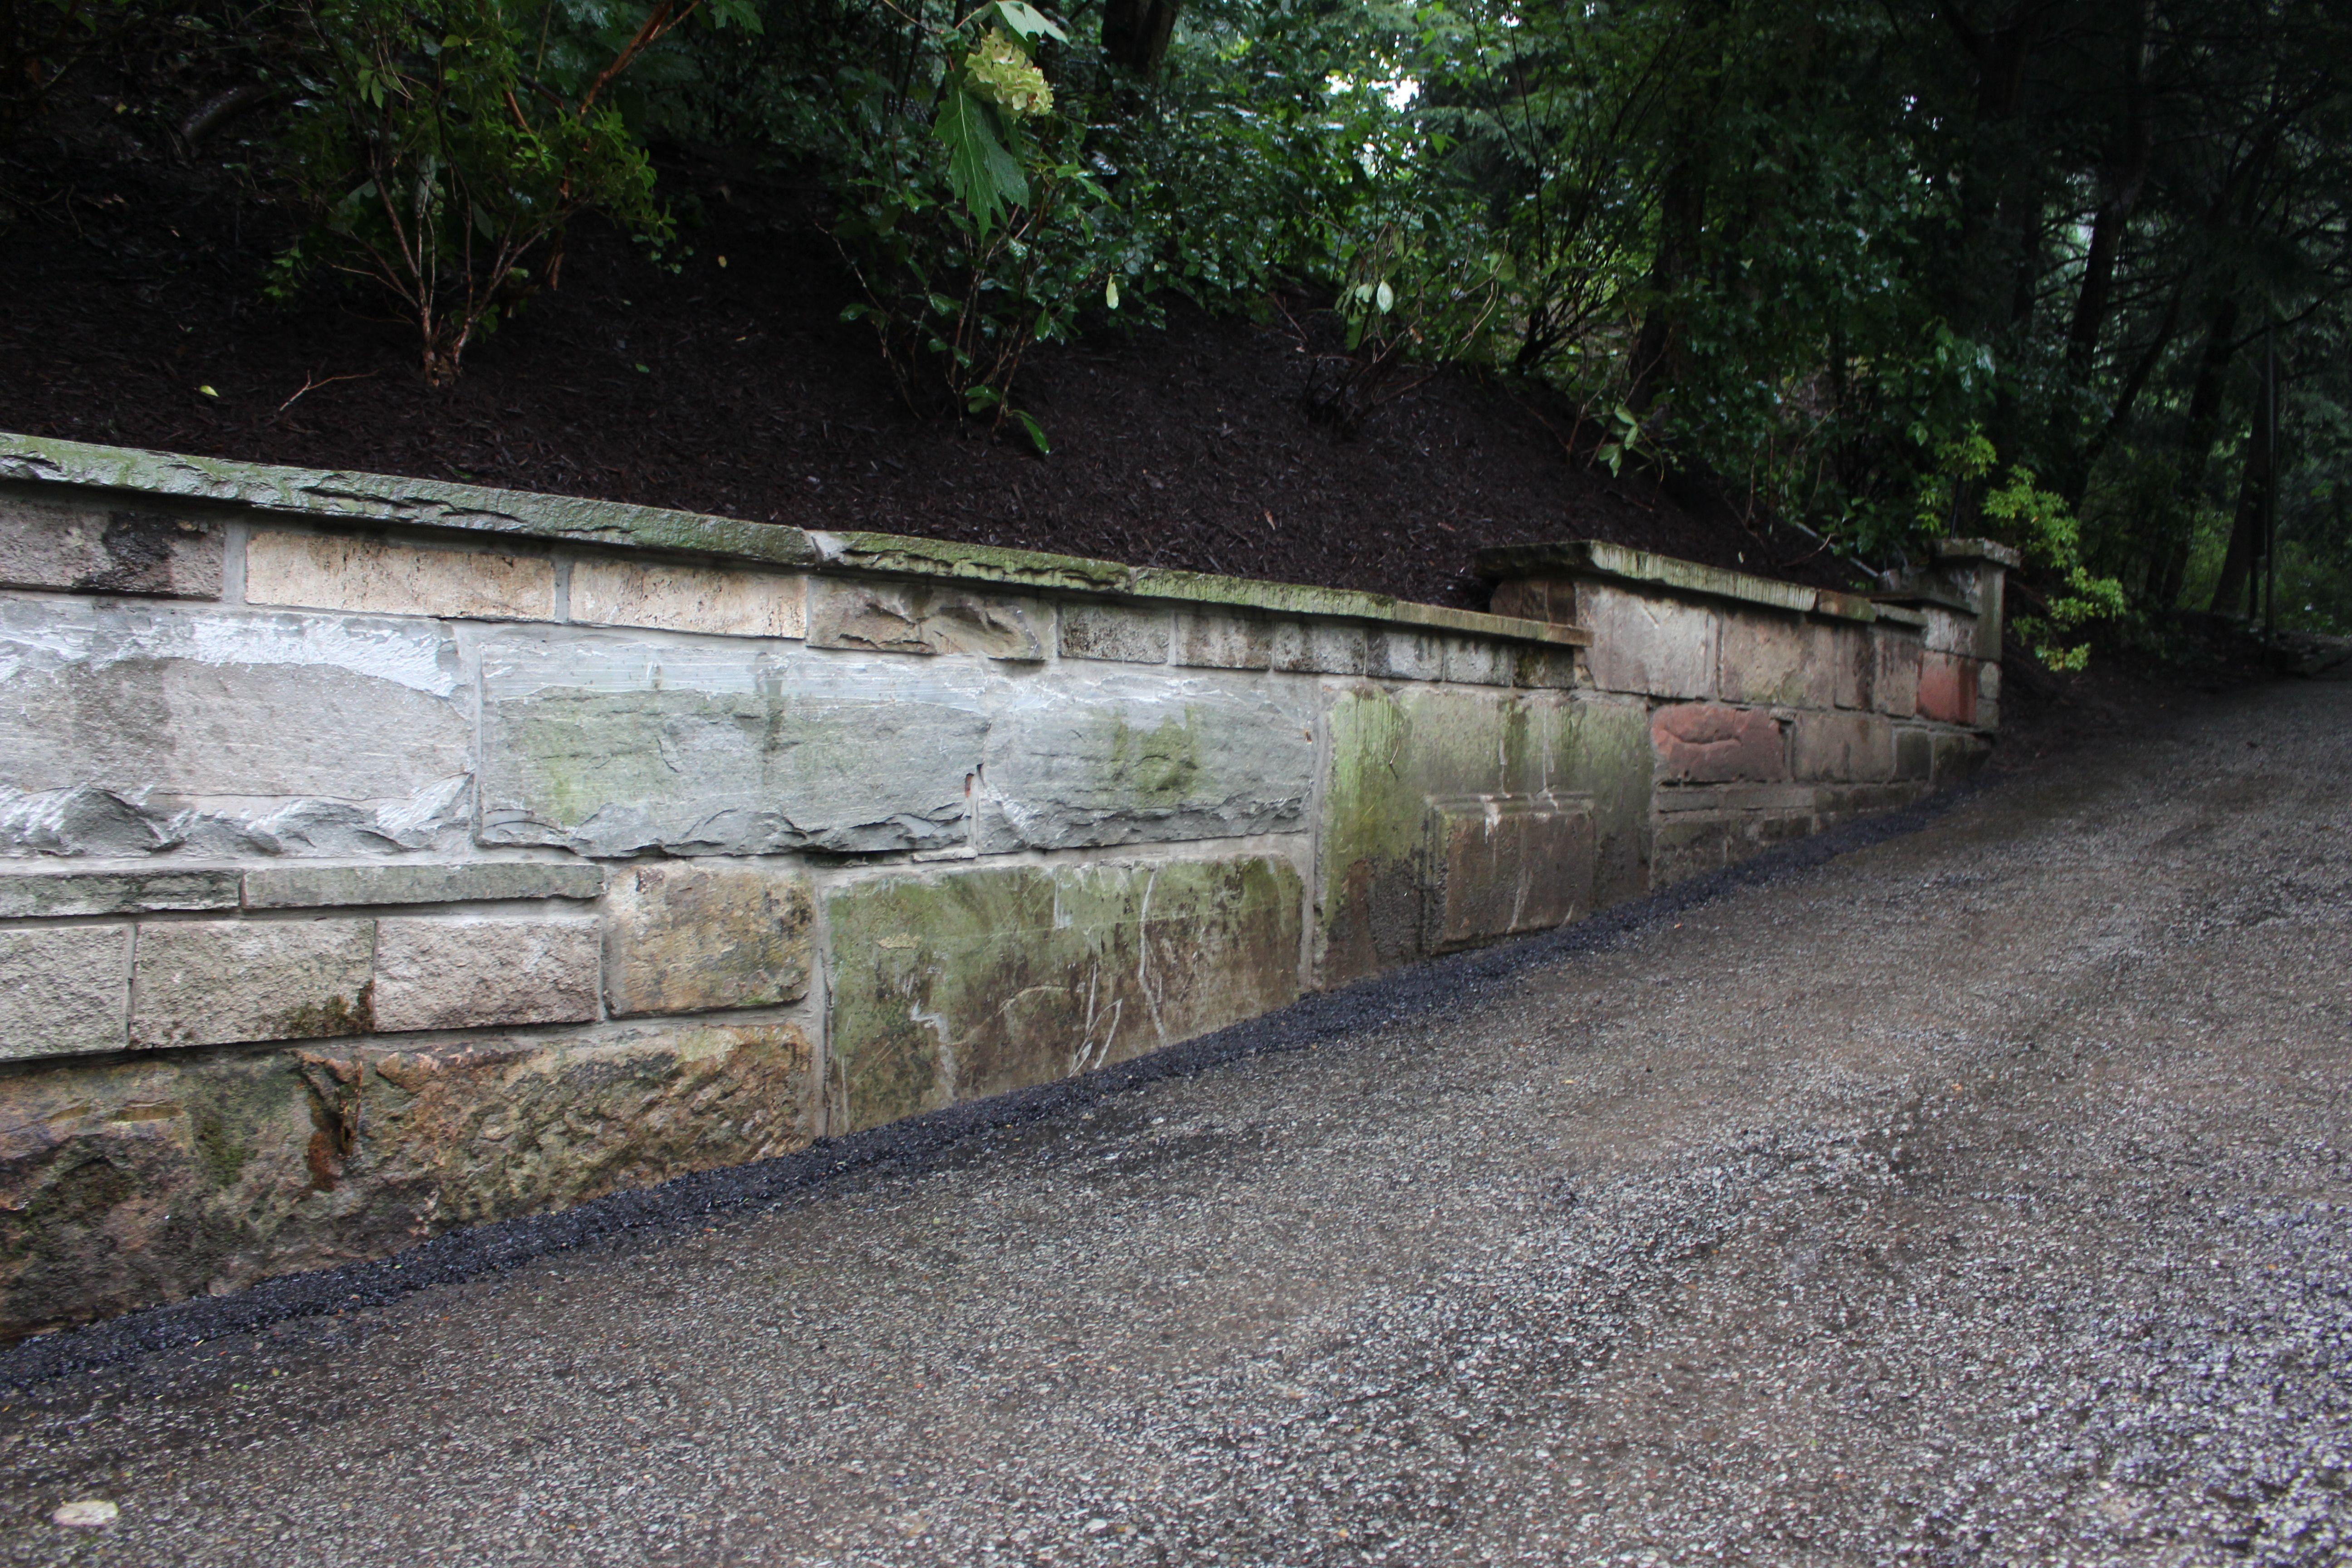 Rebuild Sandstone Granite Retaining Wall With Stone Caps Retaining Wall Stone Wall Block Wall